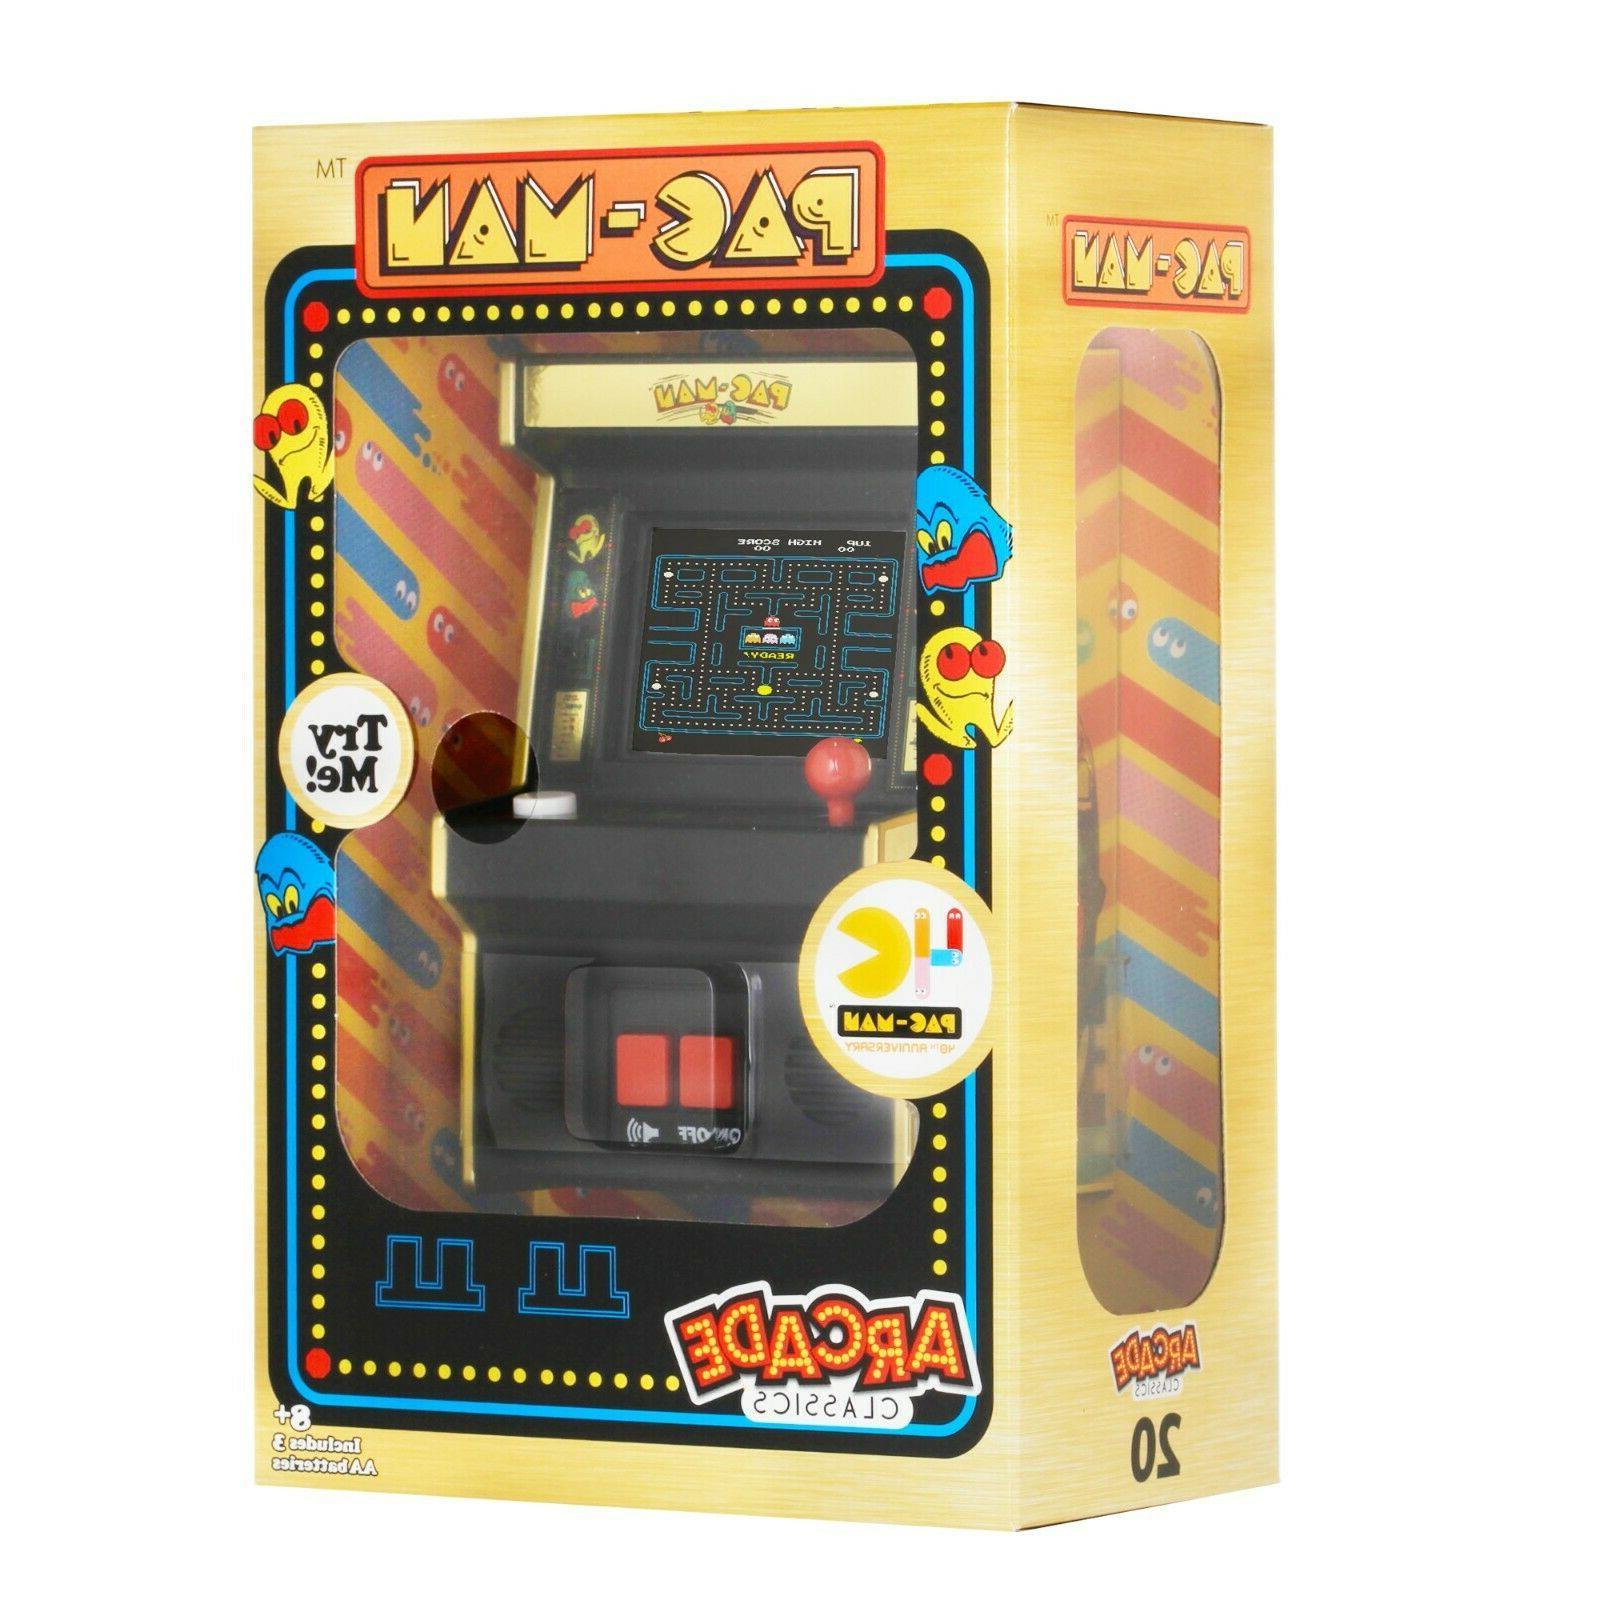 Arcade Classics Pac-Man™ 40th Aniversary Retro Mini Arcade Game - Gold Edition